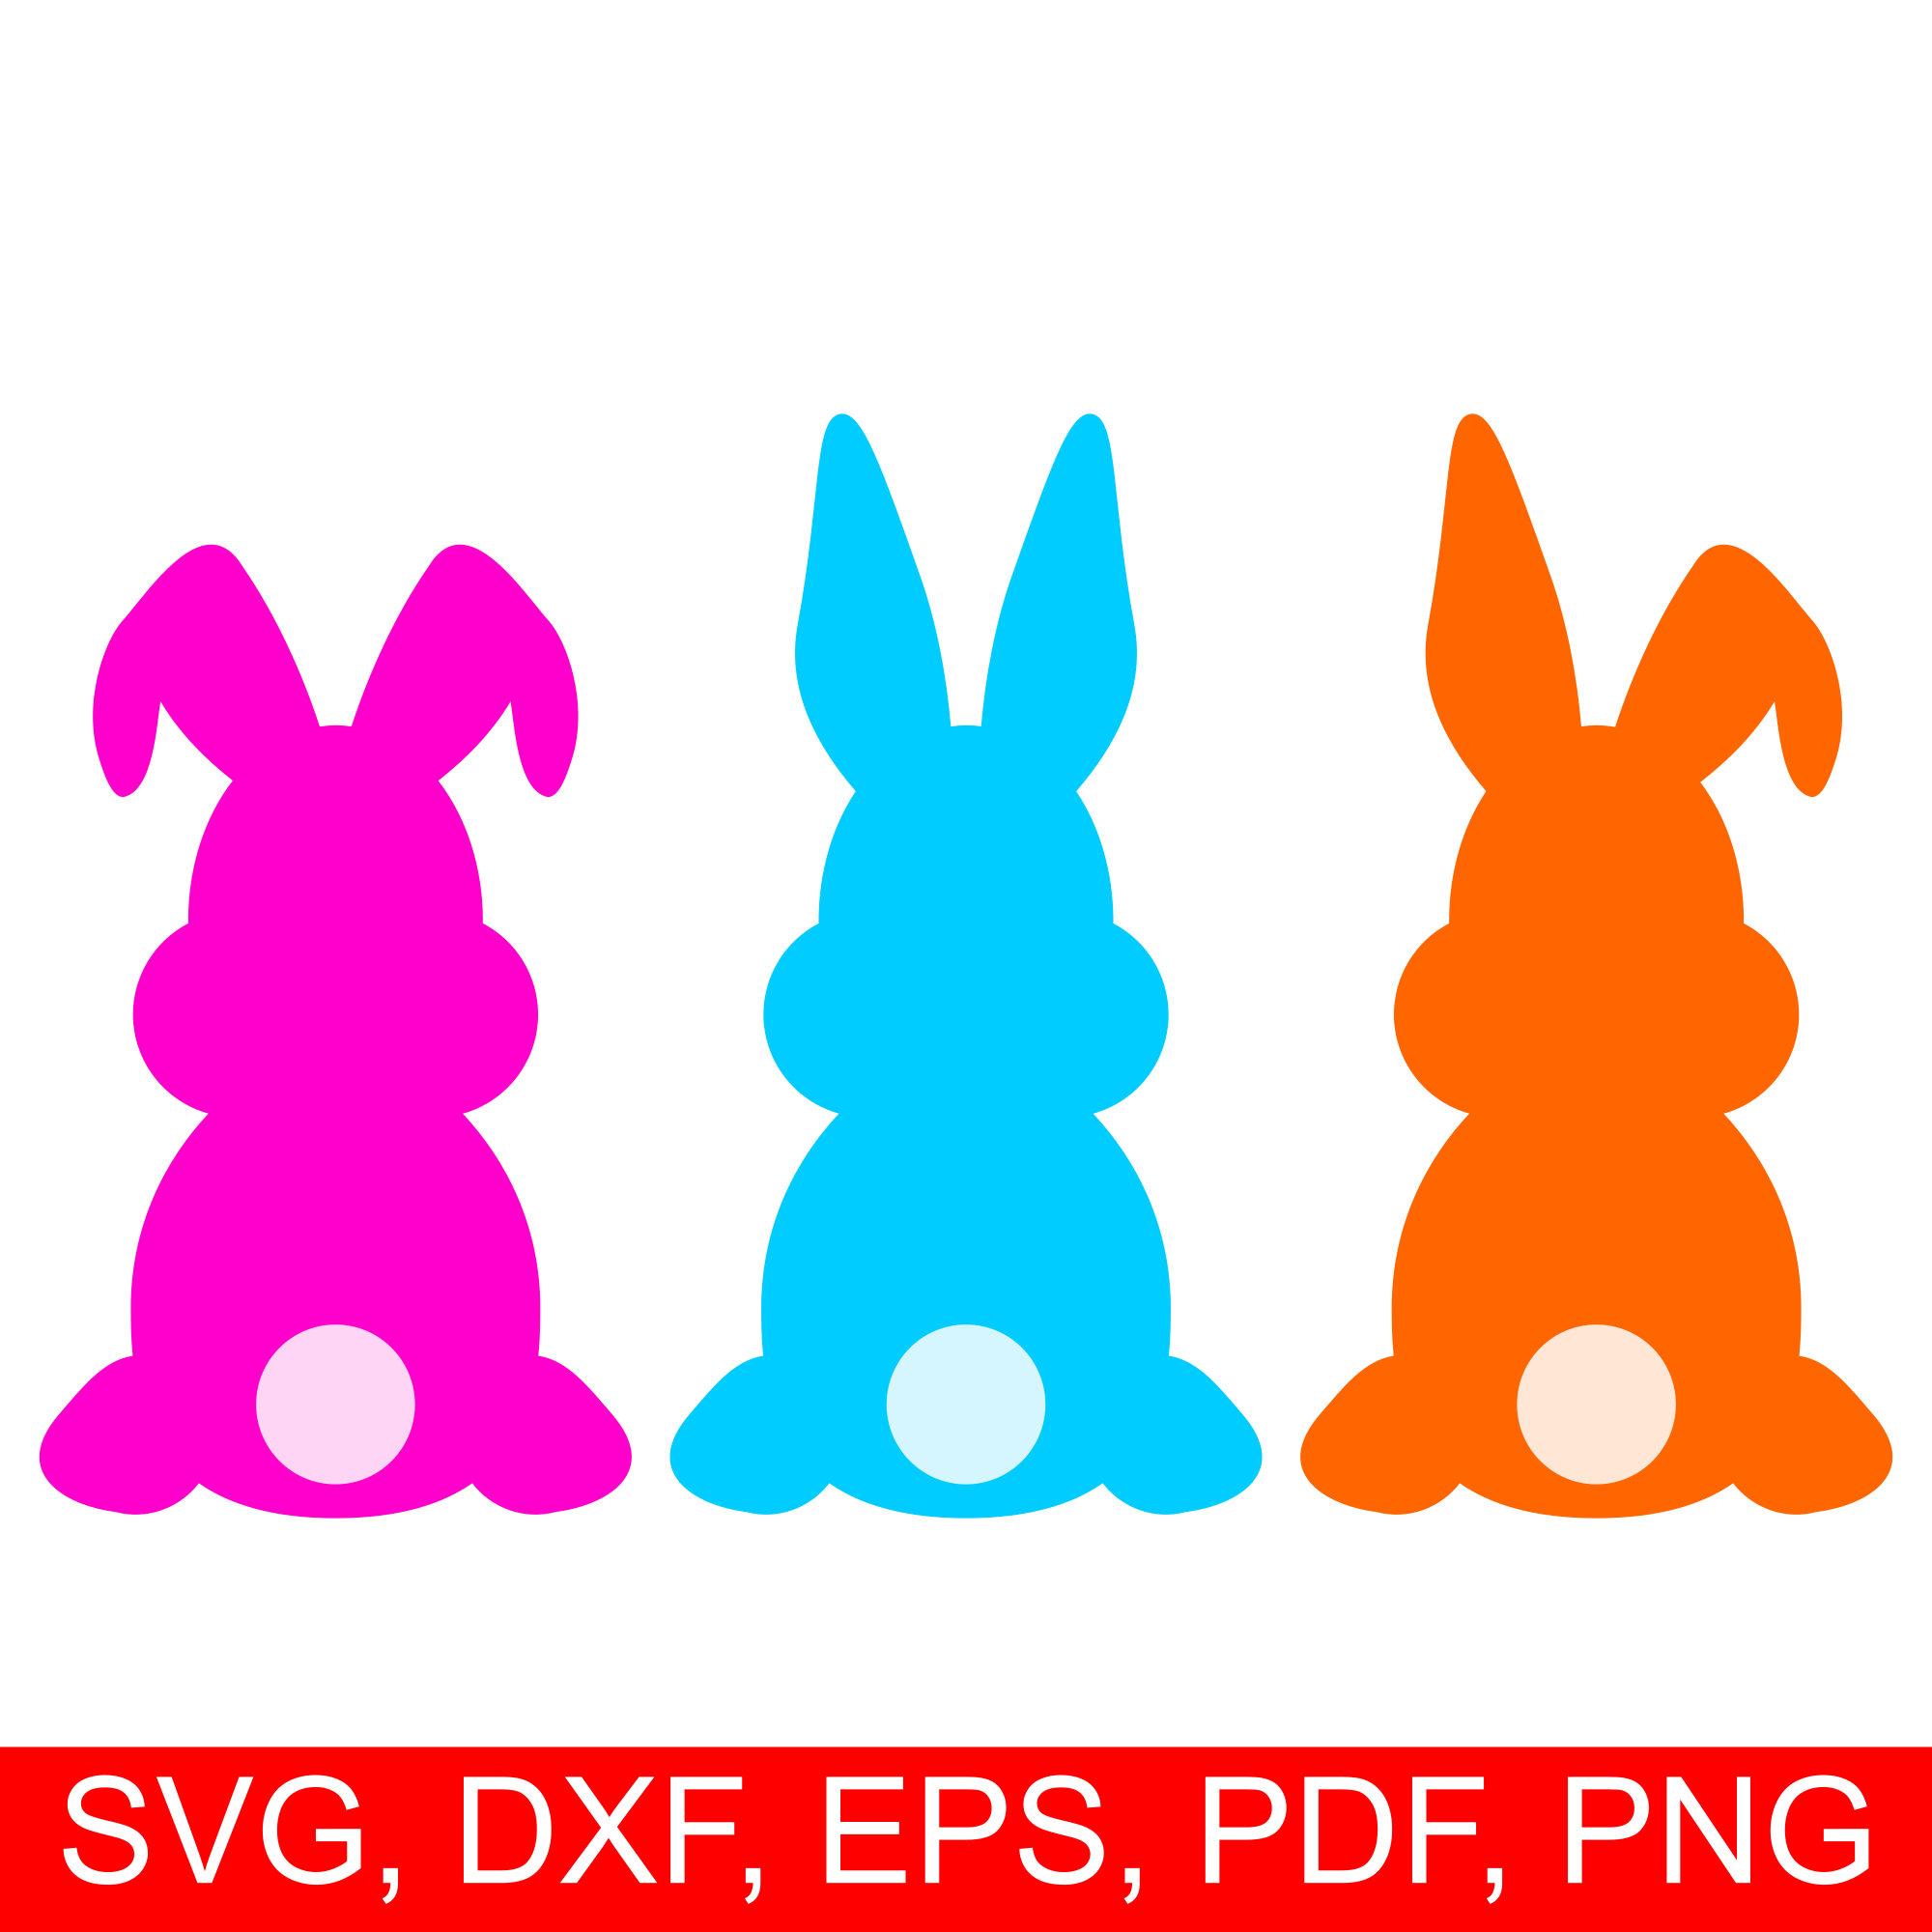 2000x2000 Easter Bunny Svg Easter Bunny Dxf Easter Bunny Clipart